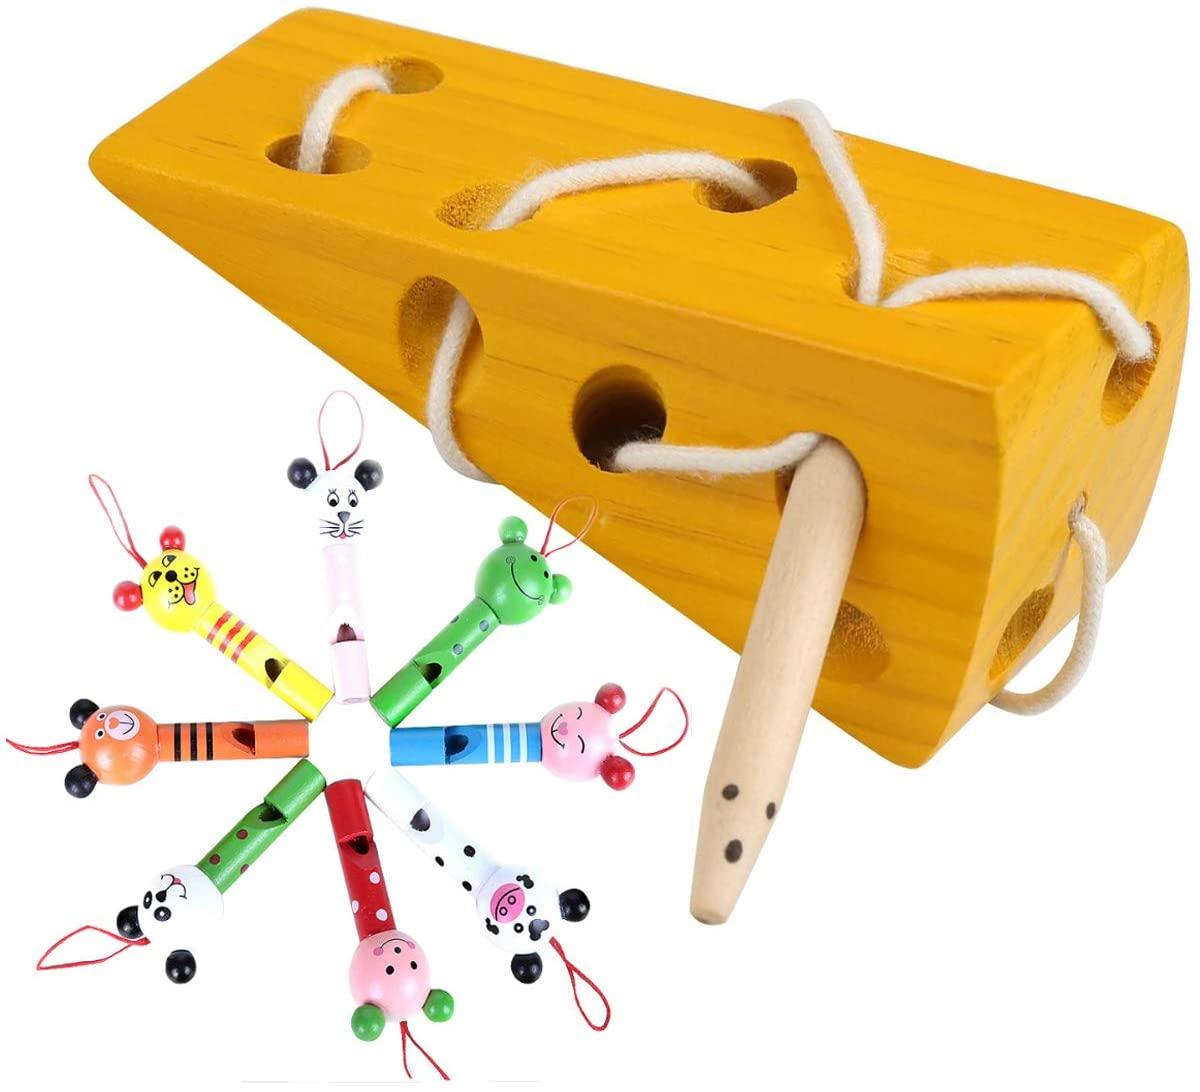 Mengger Holzkäsespielzeug Fädelspiel